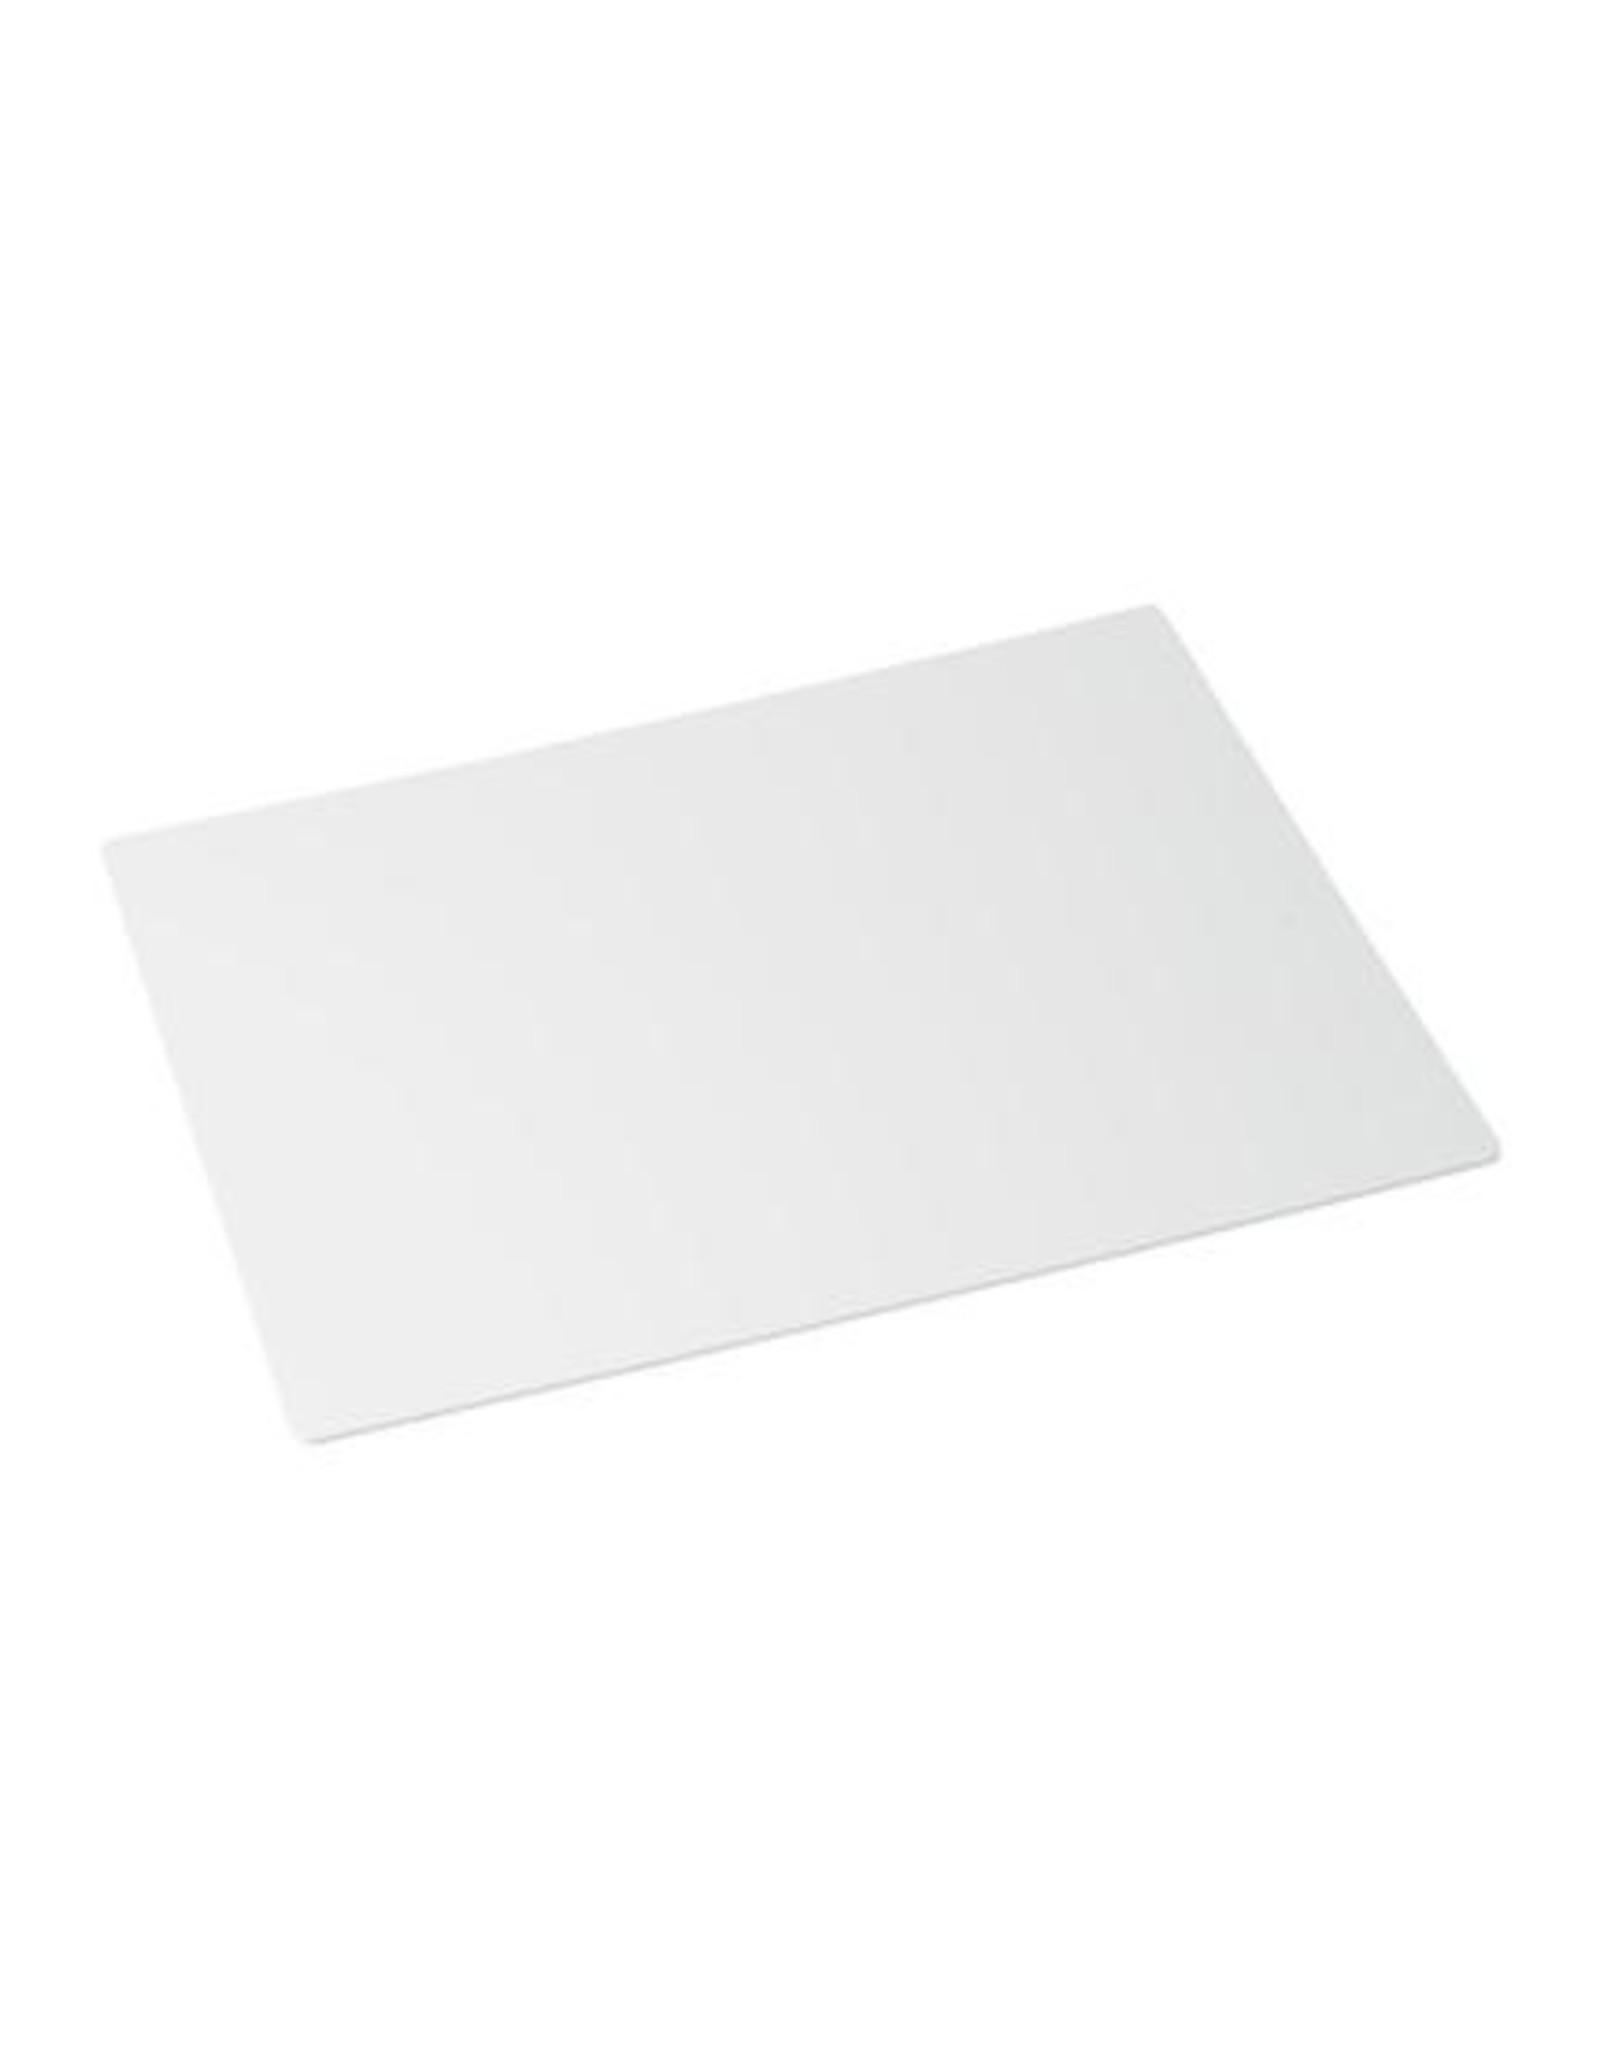 Kunststof schilderplank 30x40cm